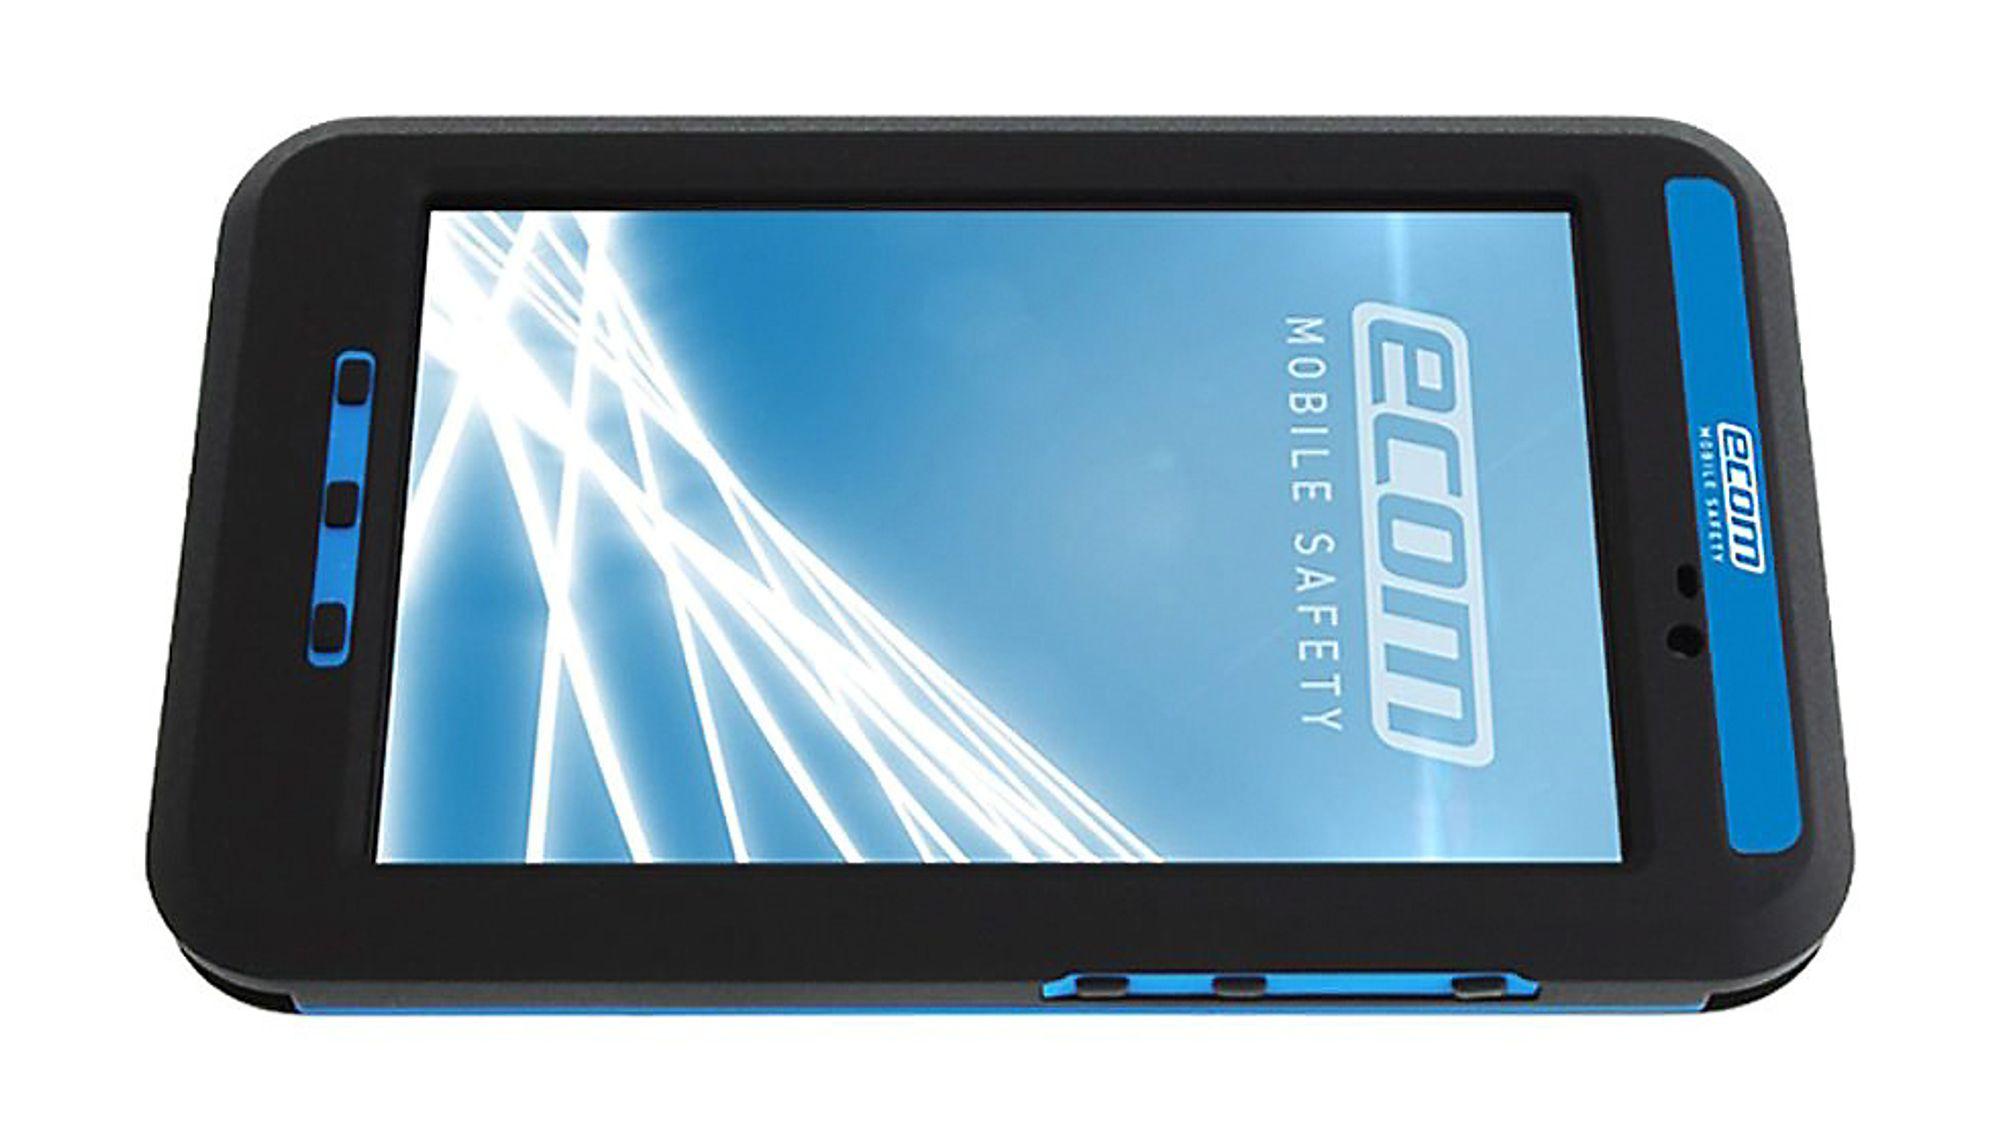 Tab-Ex fra Ecom. Nettbrett basert på Samsung Galaxy Tab Active. Godkjent for Ex sone 1. Android 4.4